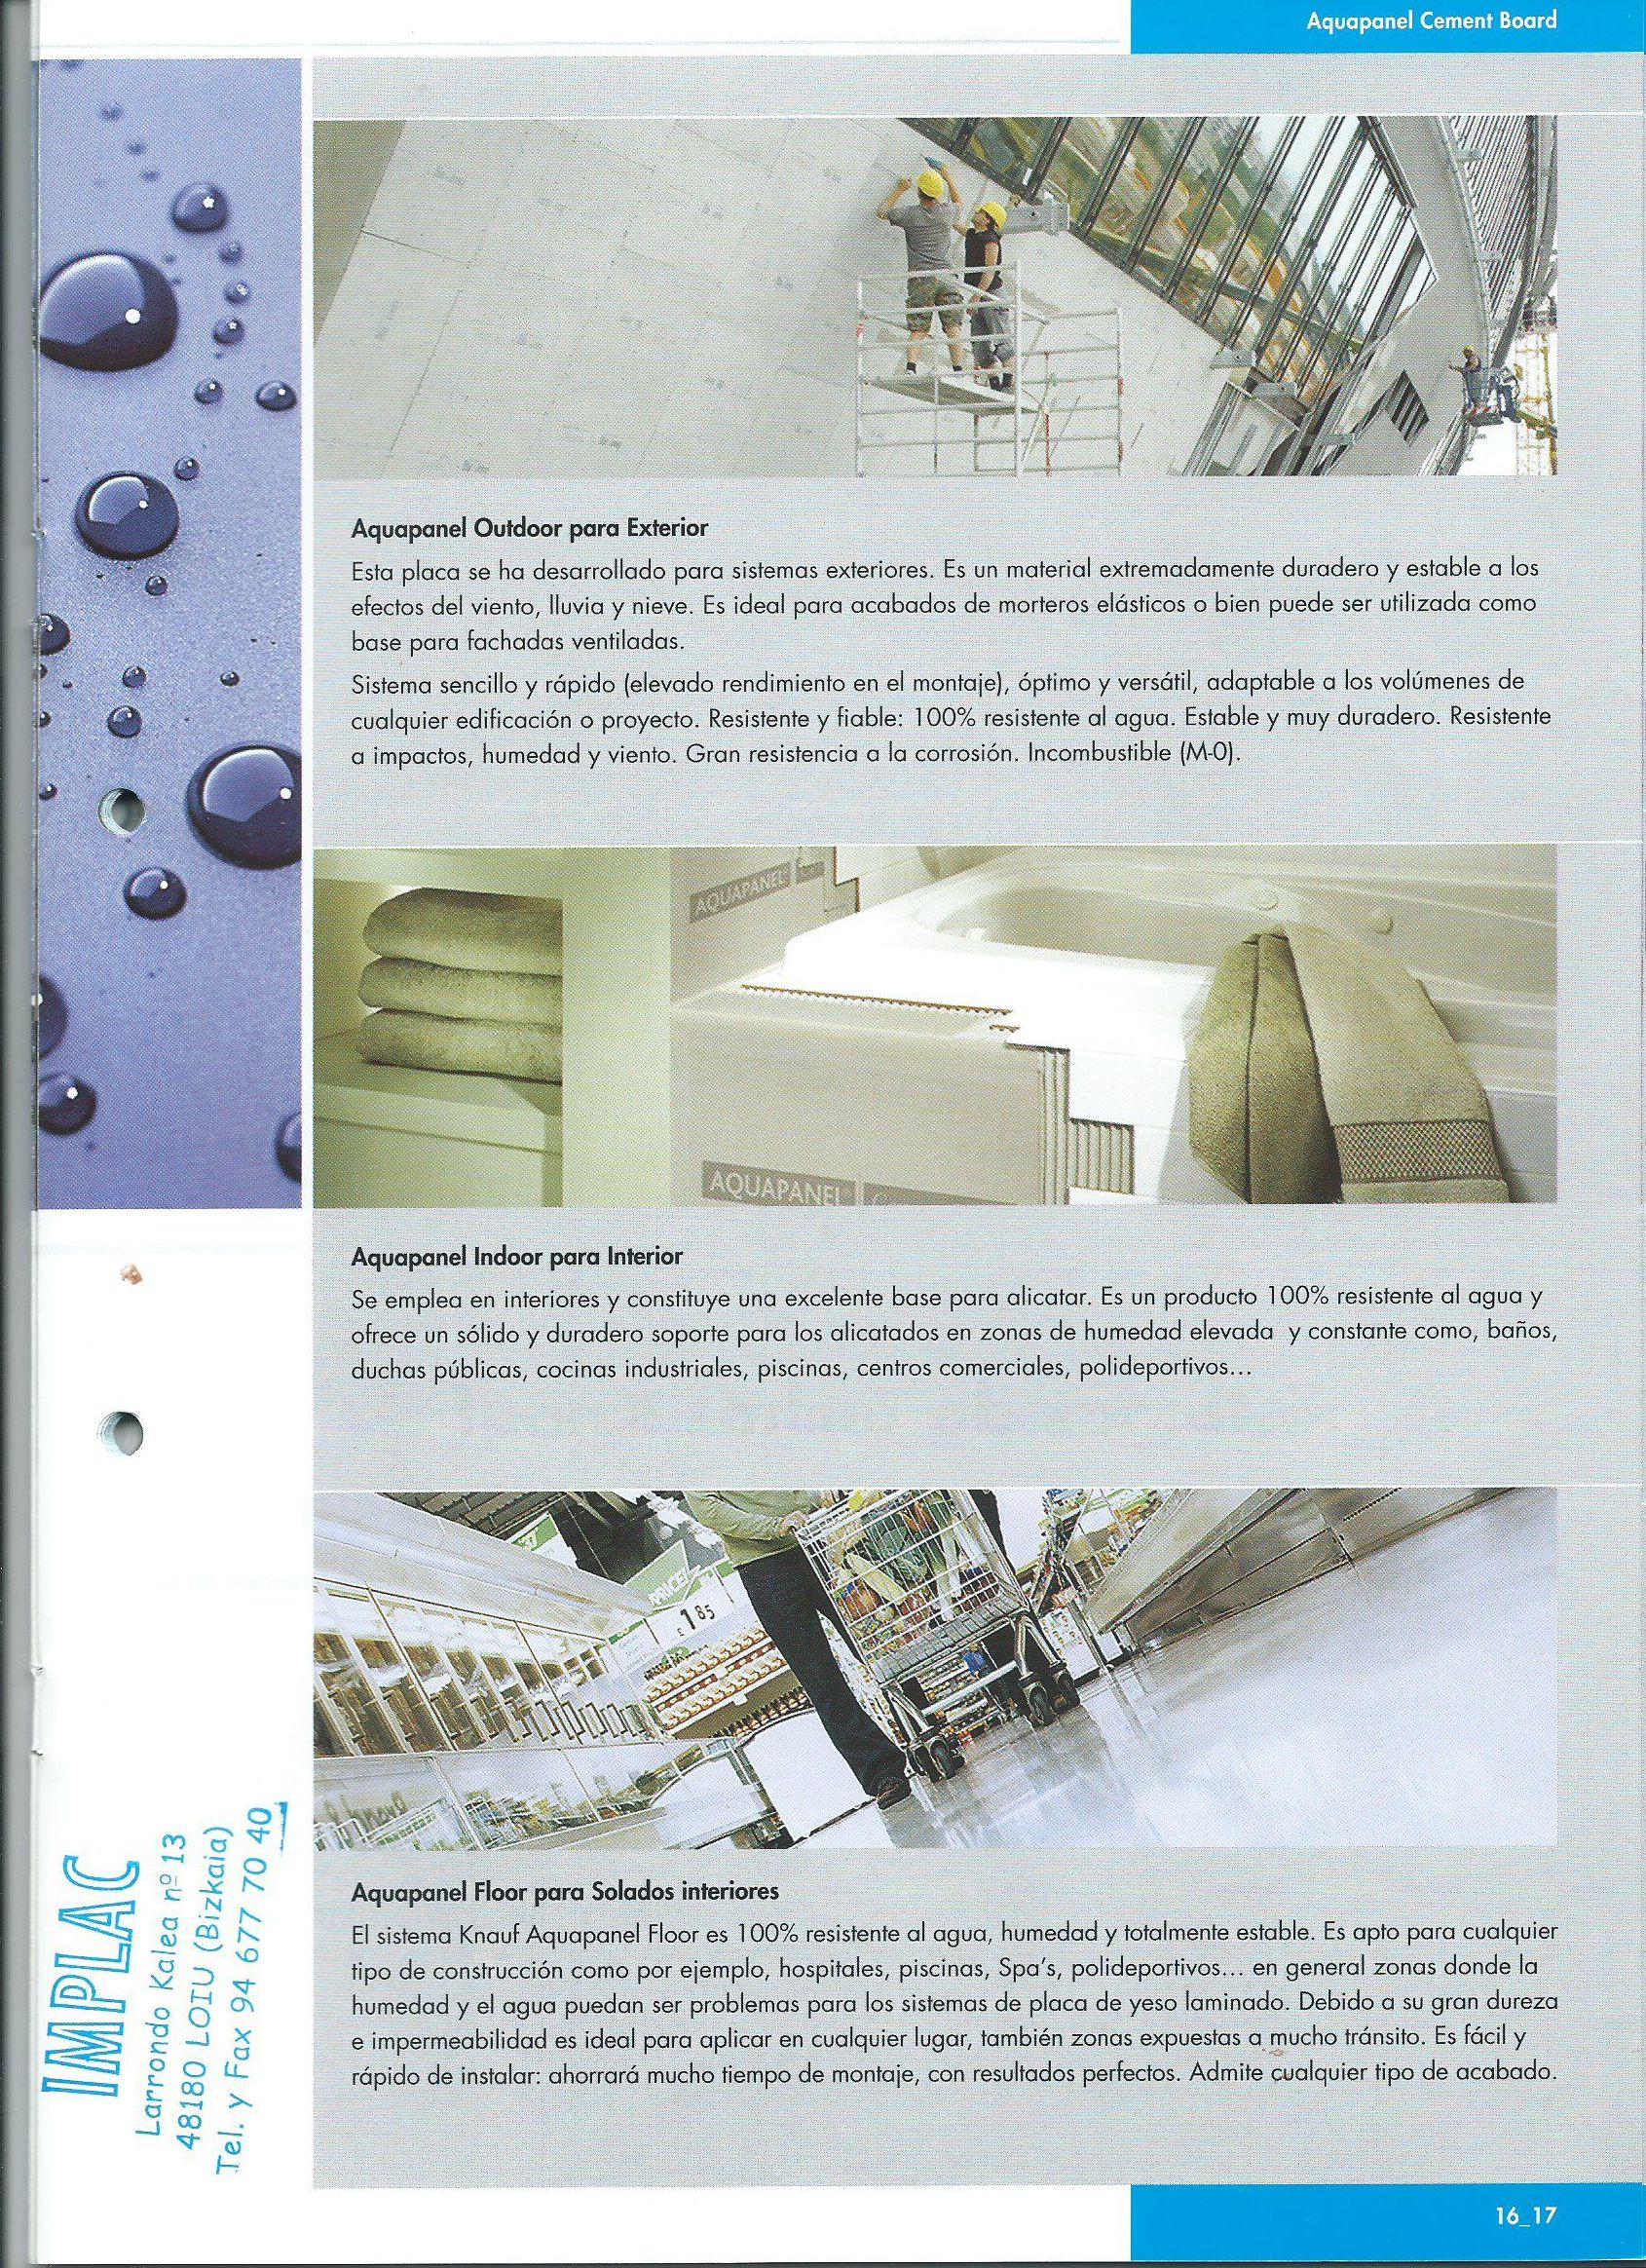 Aquapanel Cement Board